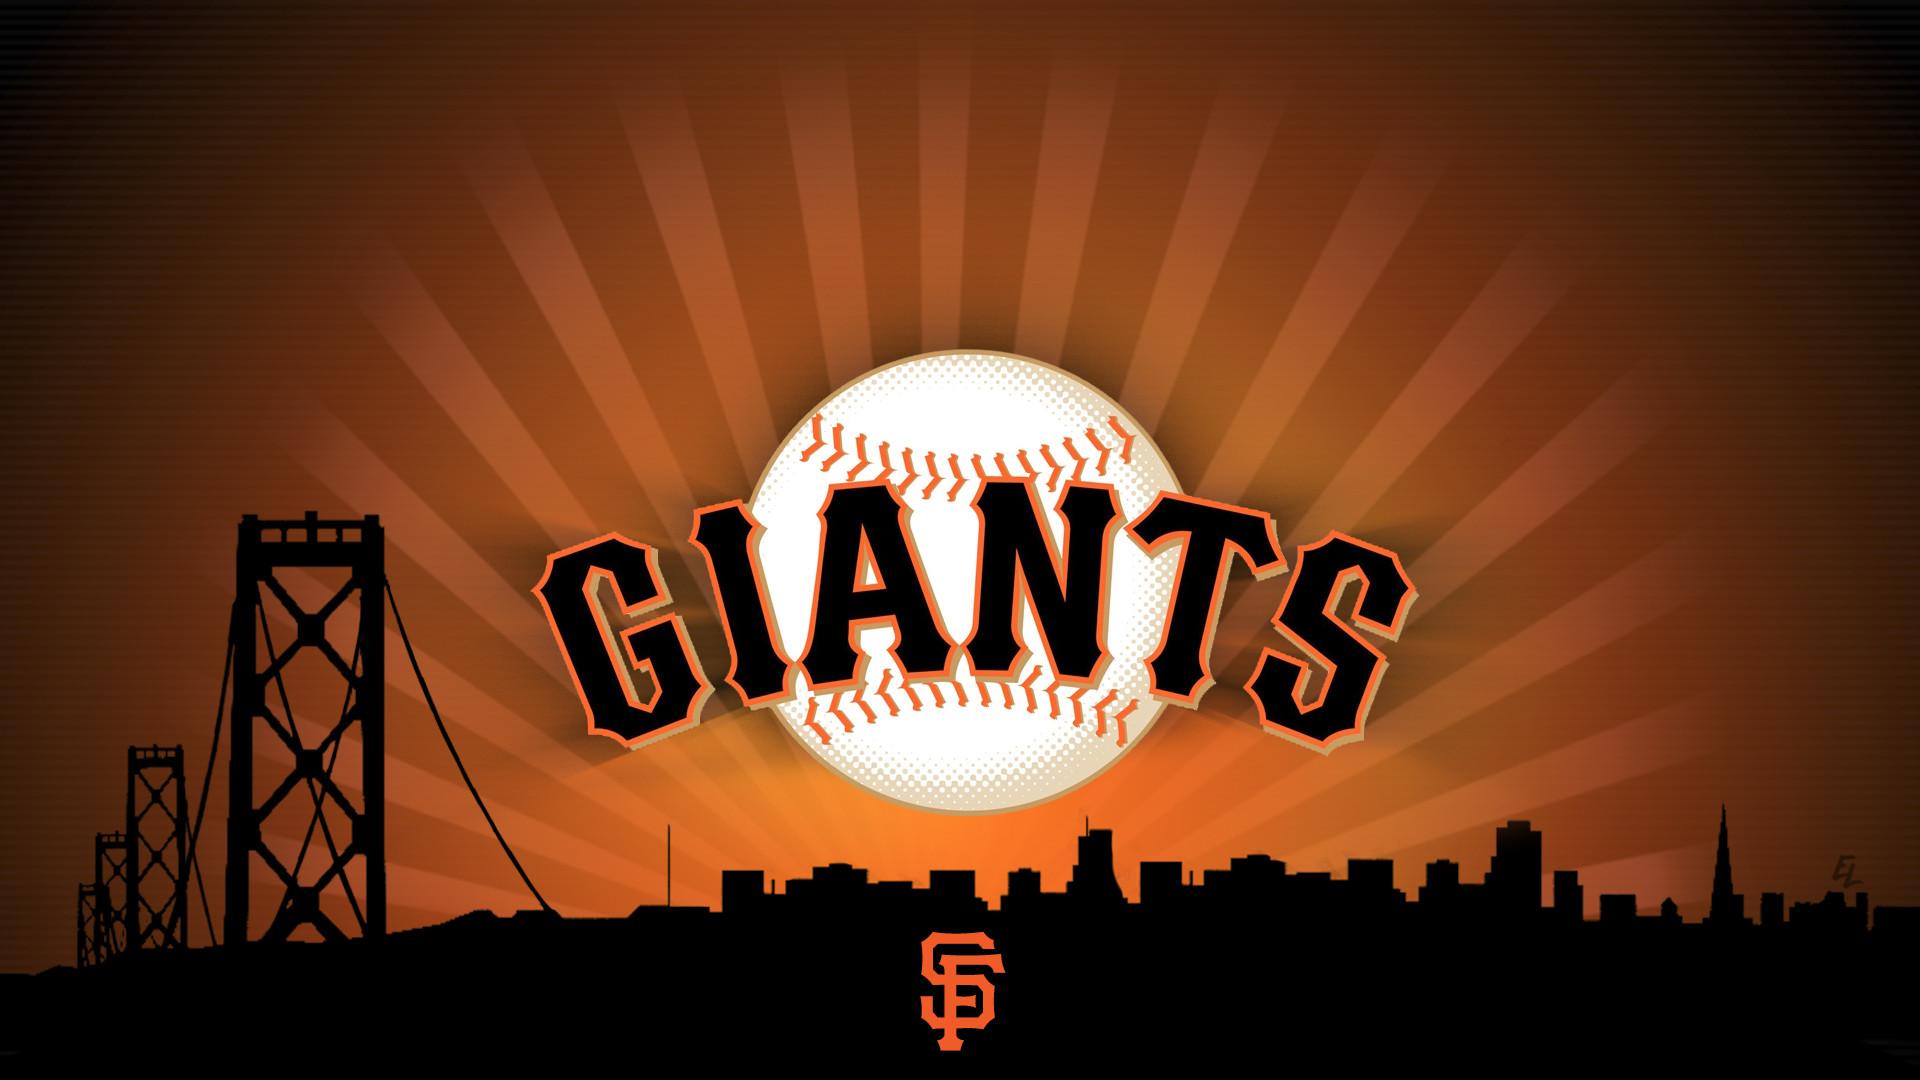 San Francisco Giants Wallpaper. Giants Wallpaper& Collection : SFGiants